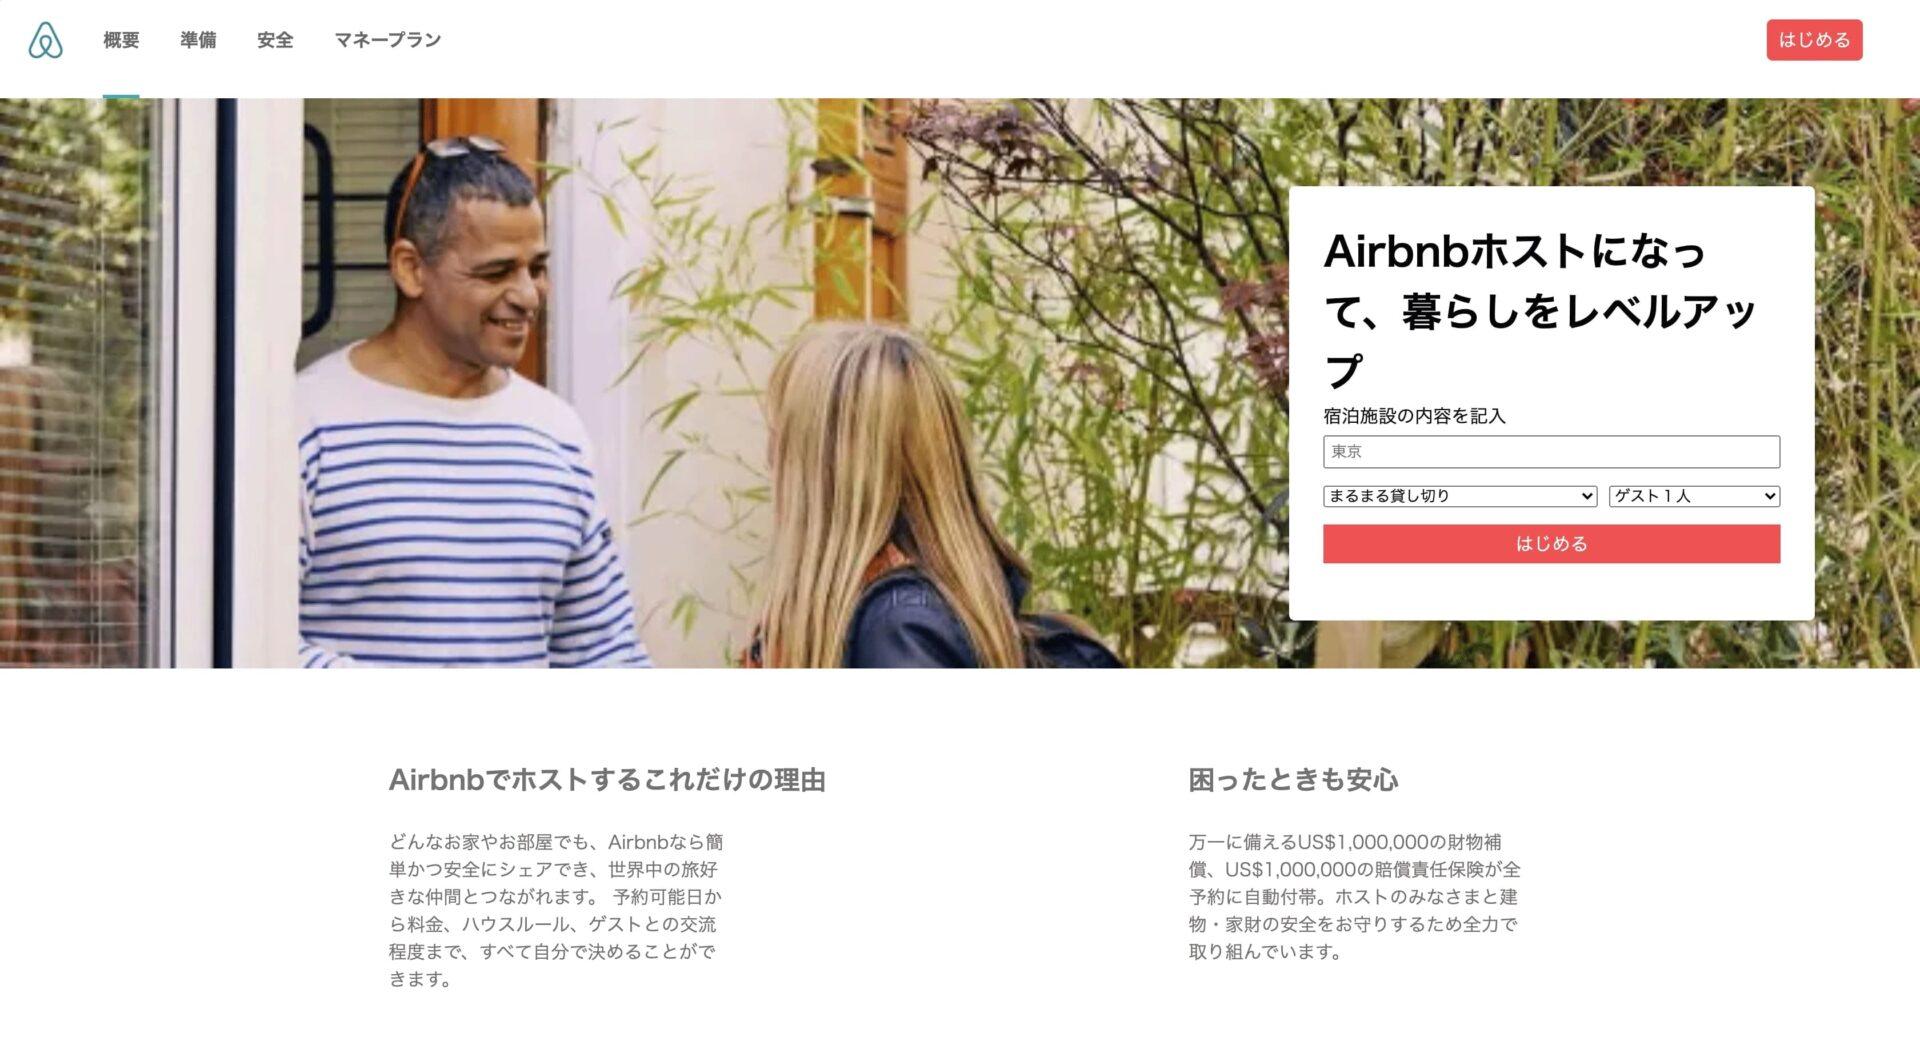 Airbnb_copy_top